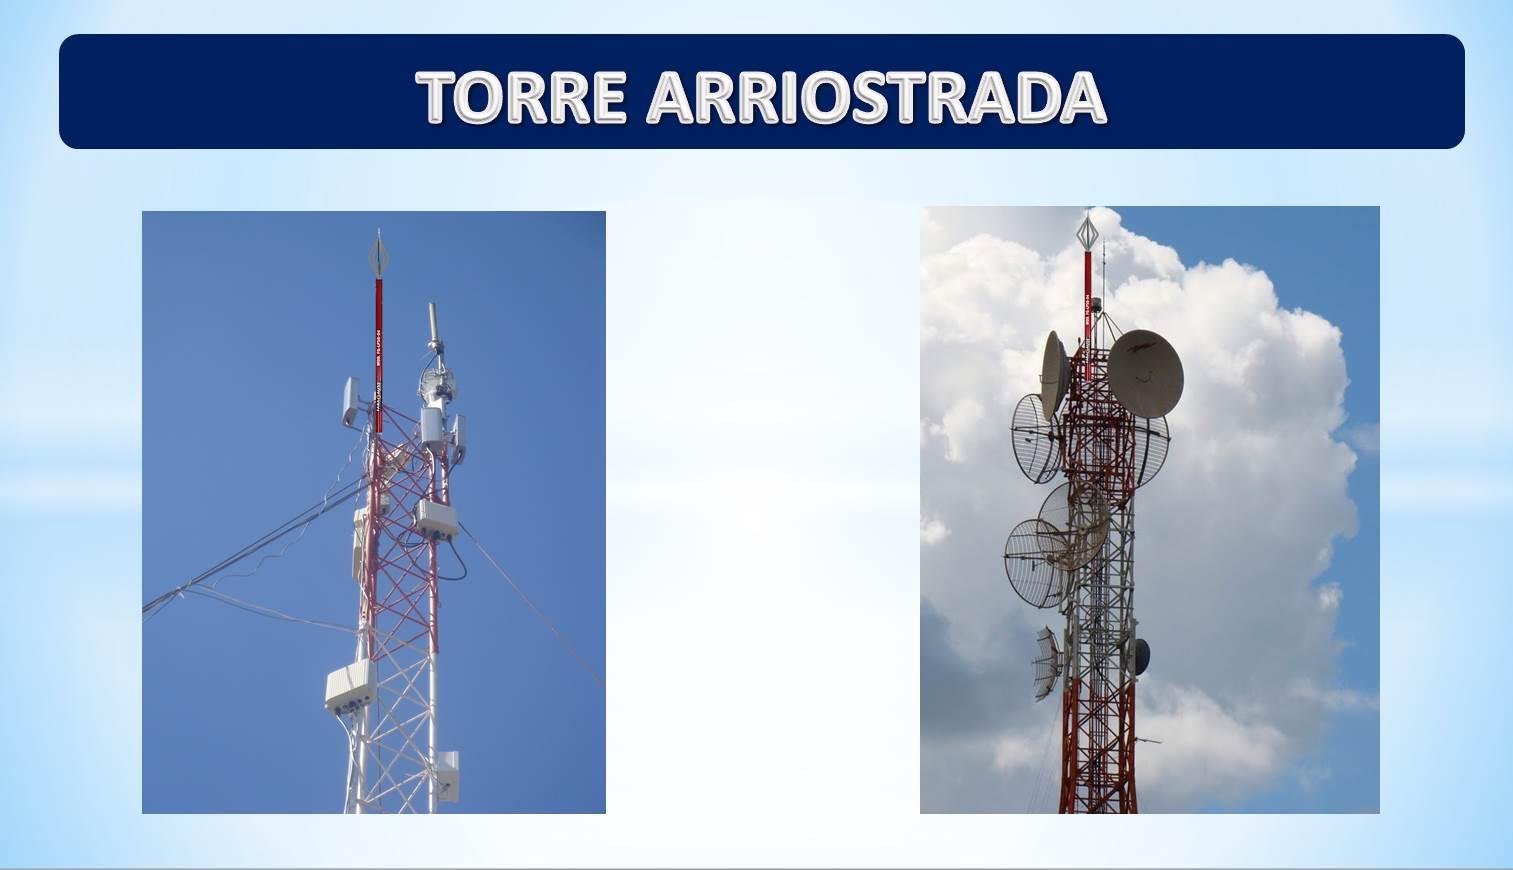 TORRE ARRIOSTRADA 1